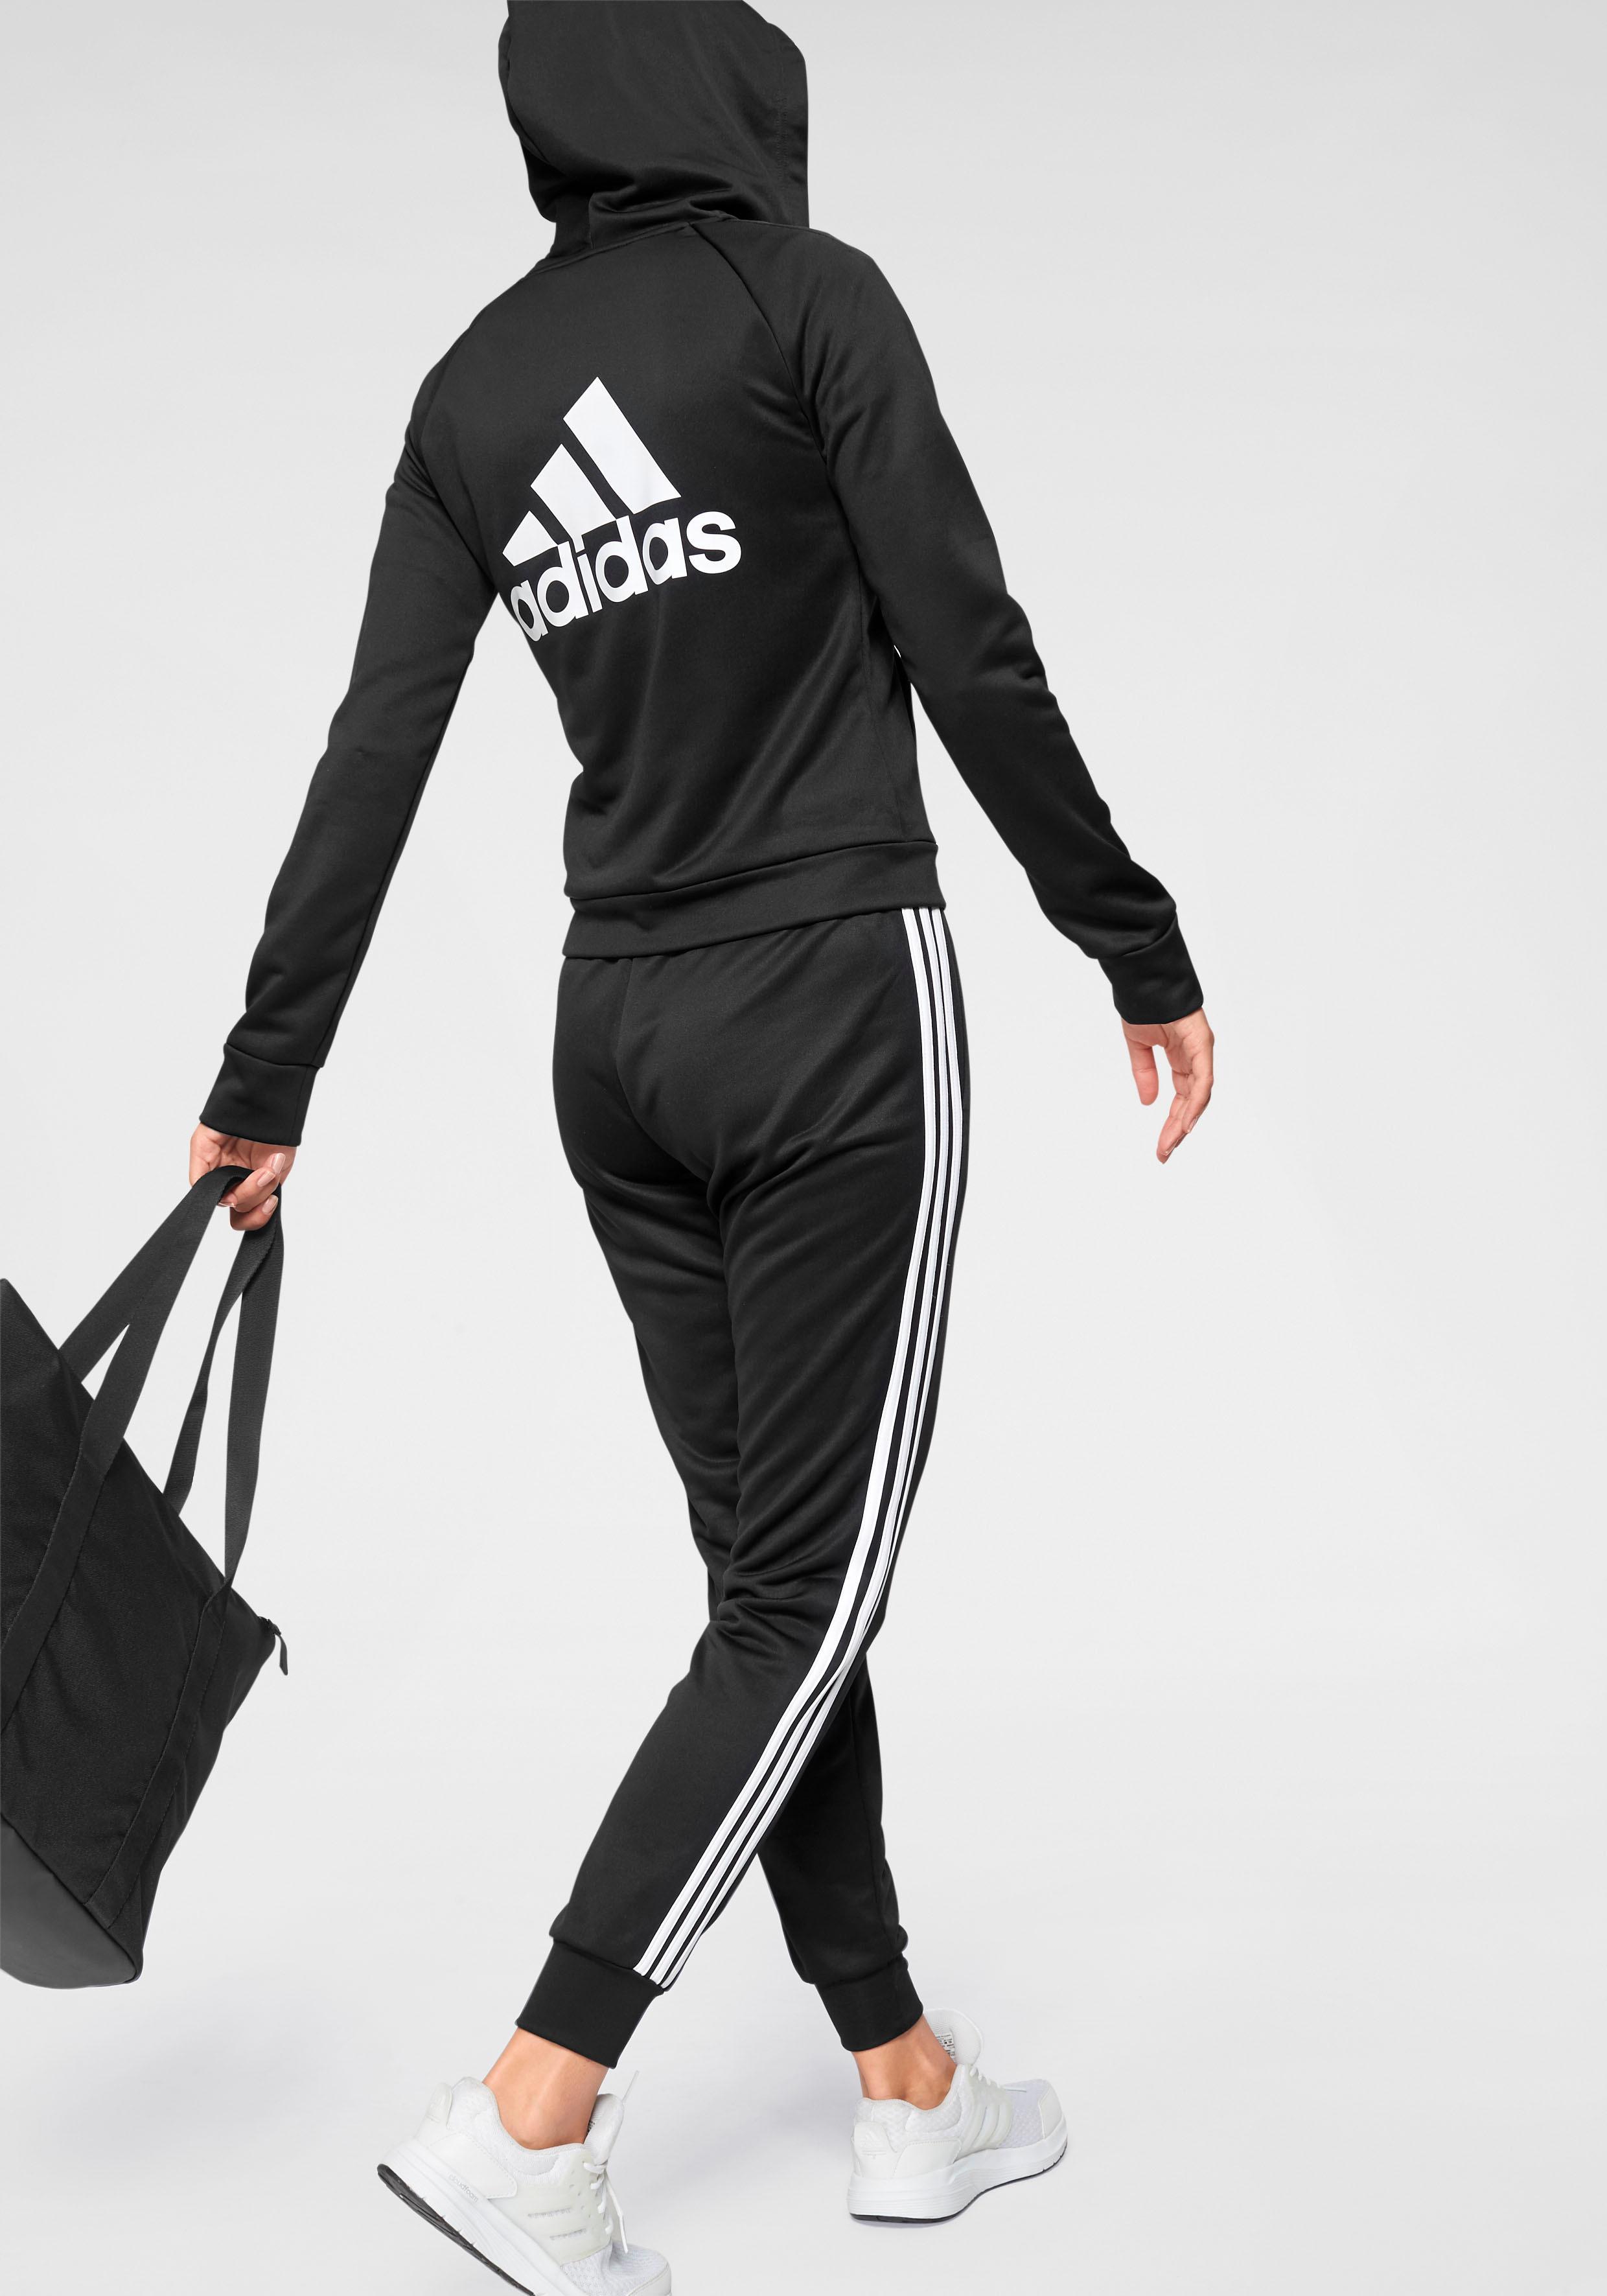 wholesale sales 100% high quality save off adidas Performance Trainingsanzug »TRACKSUIT BIG BOS COL« (Set, 2 tlg.)  bestellen | BAUR